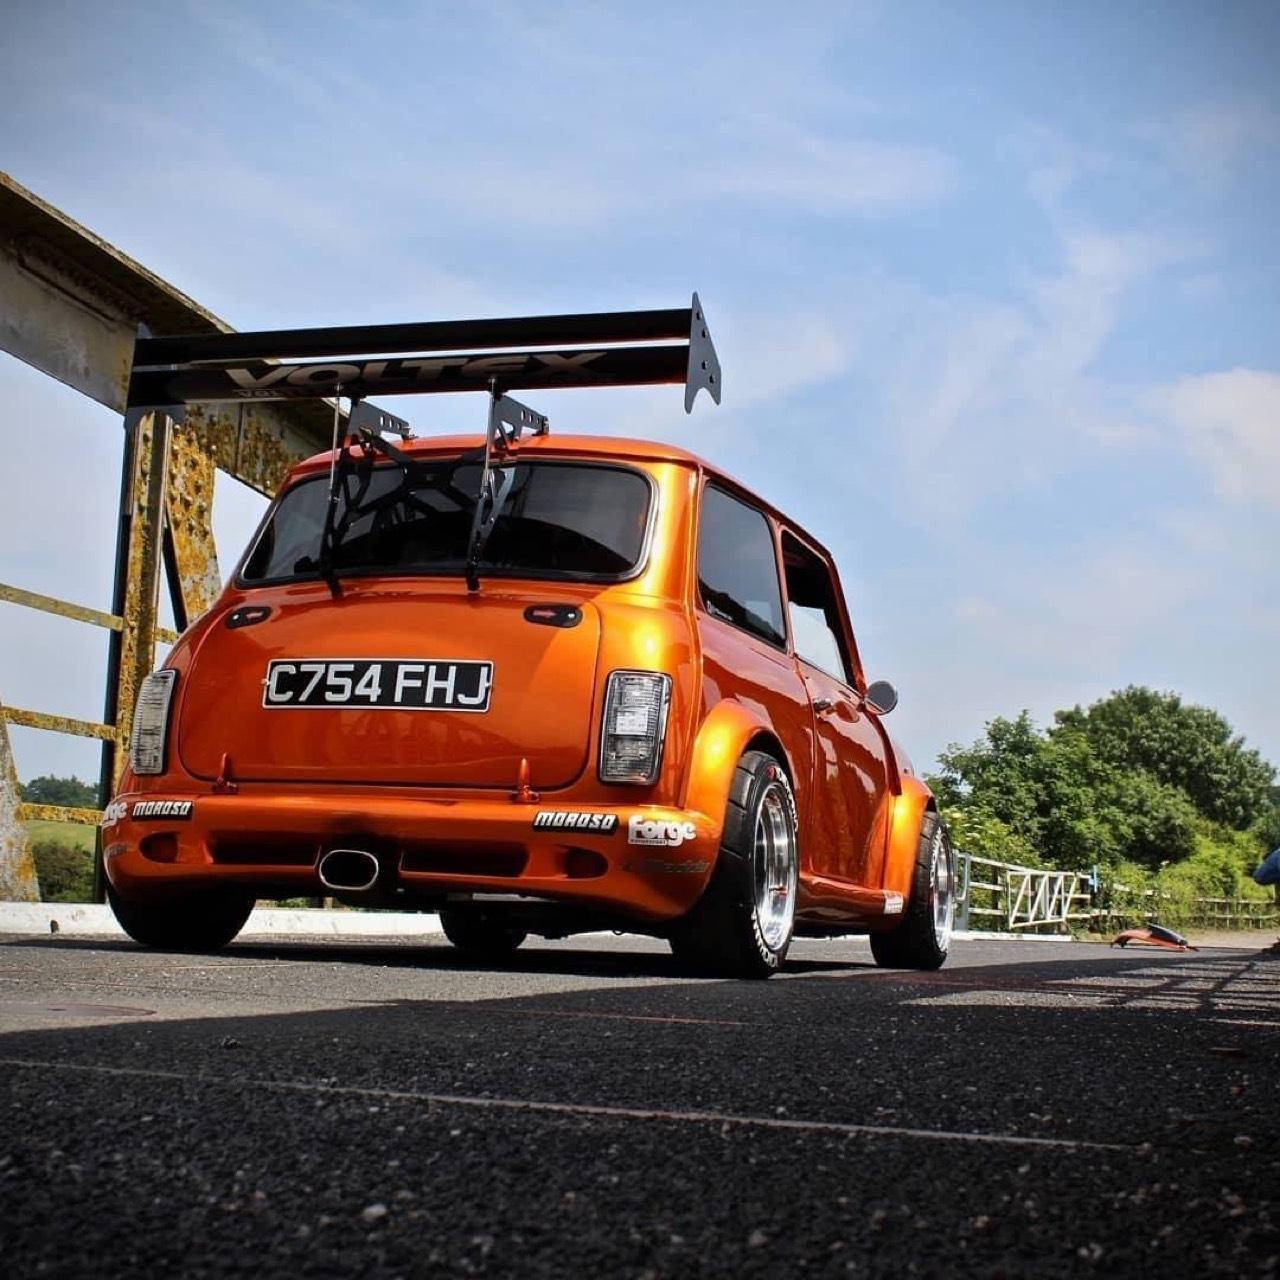 Austin Mini B16 Turbo... Shootée aux hormones ! 3